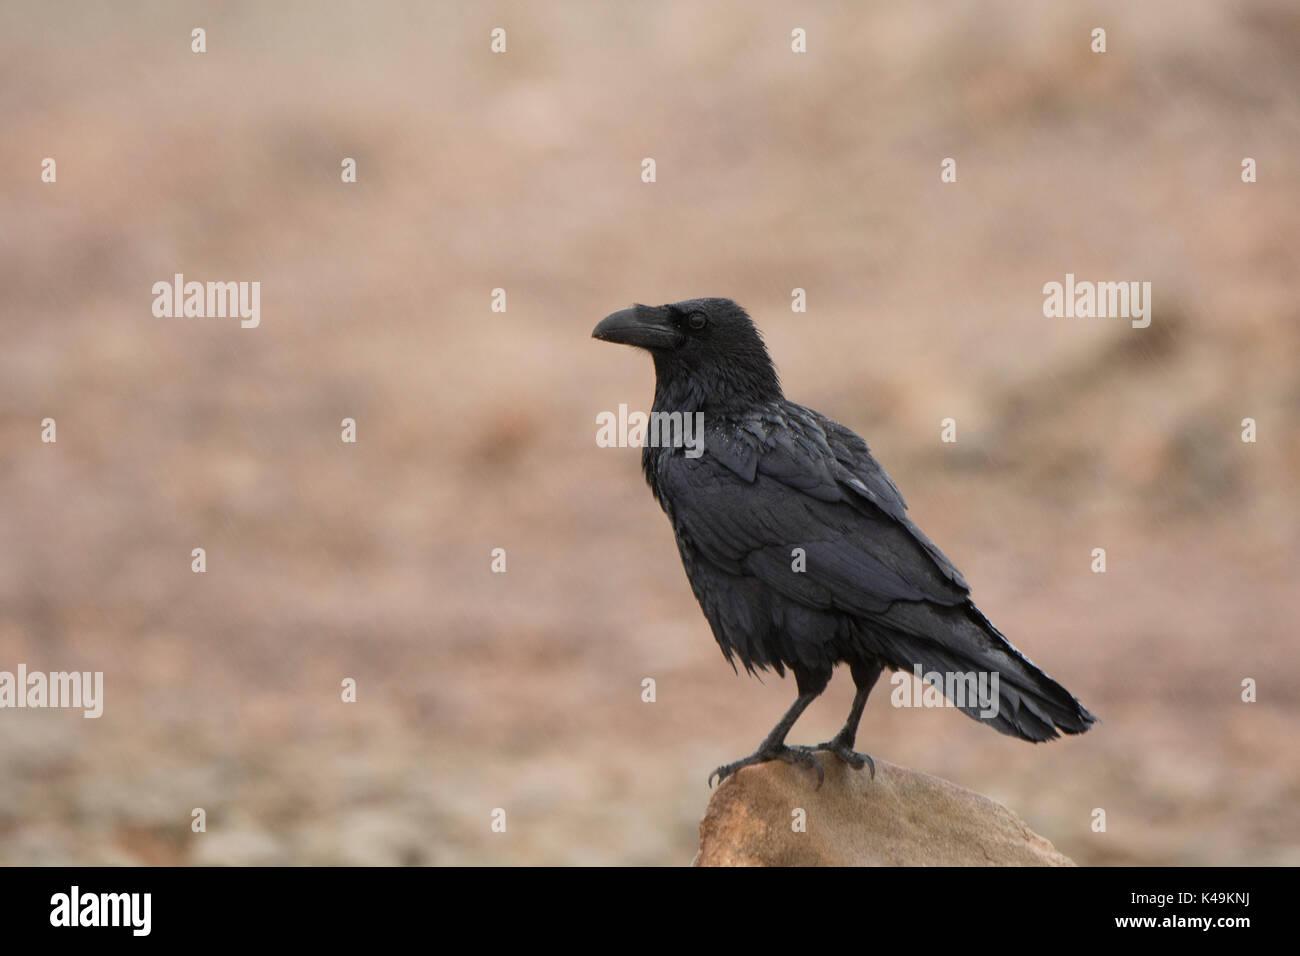 Gemeinsamen Raven-Corvus Corax Fuertuventura Kanarische Inseln Stockbild